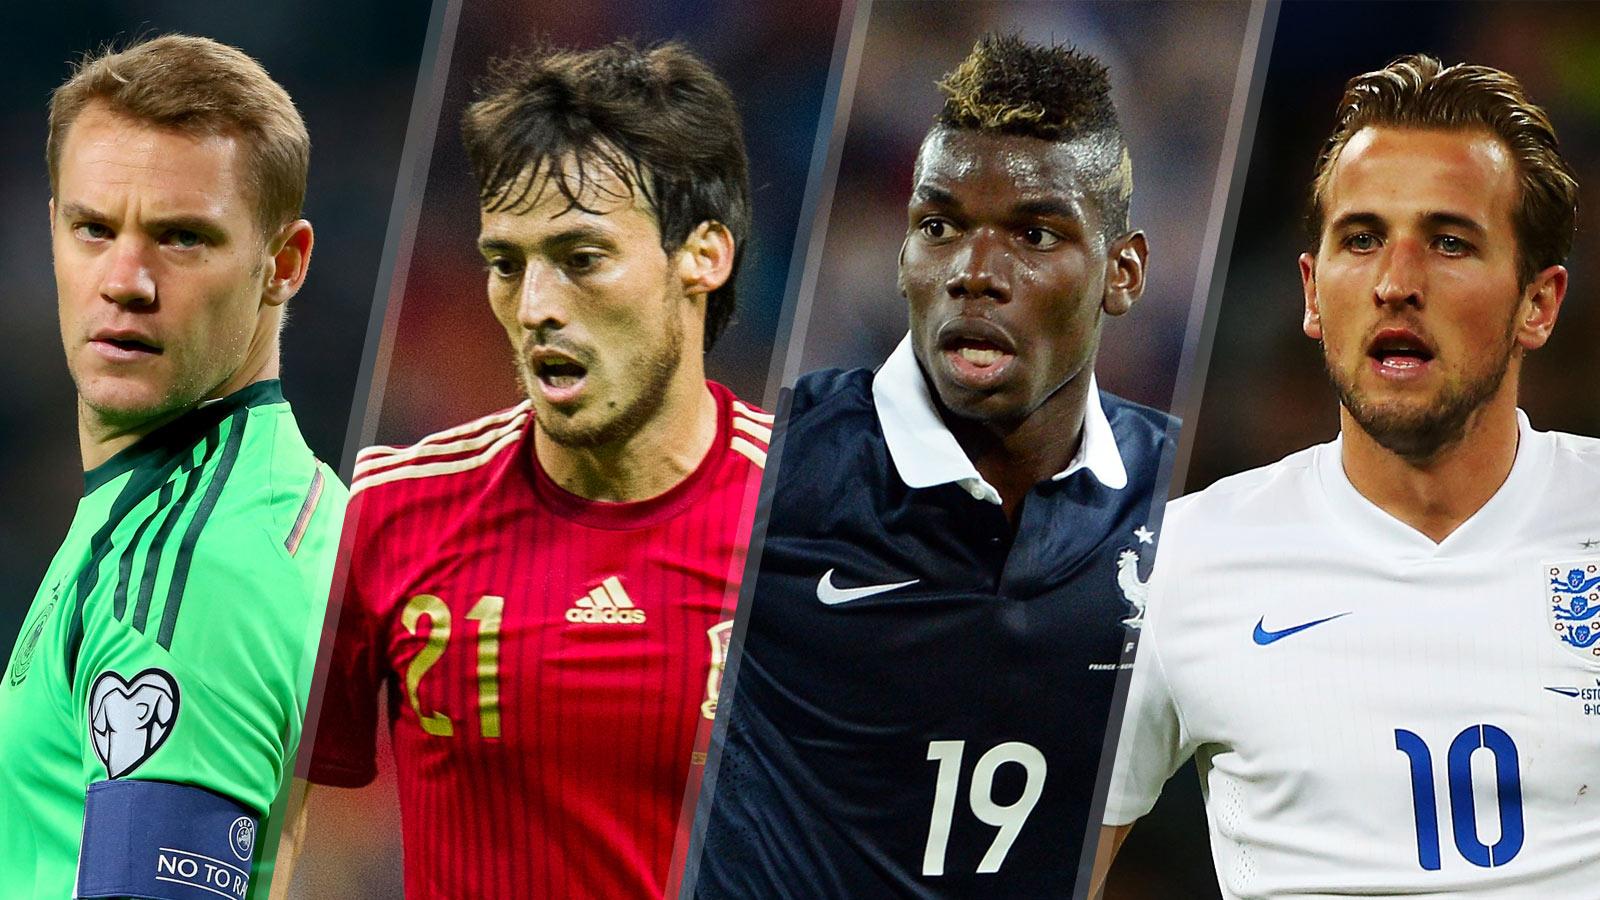 Matches to Watch: International friendlies facilitate Euro 2016 preparation